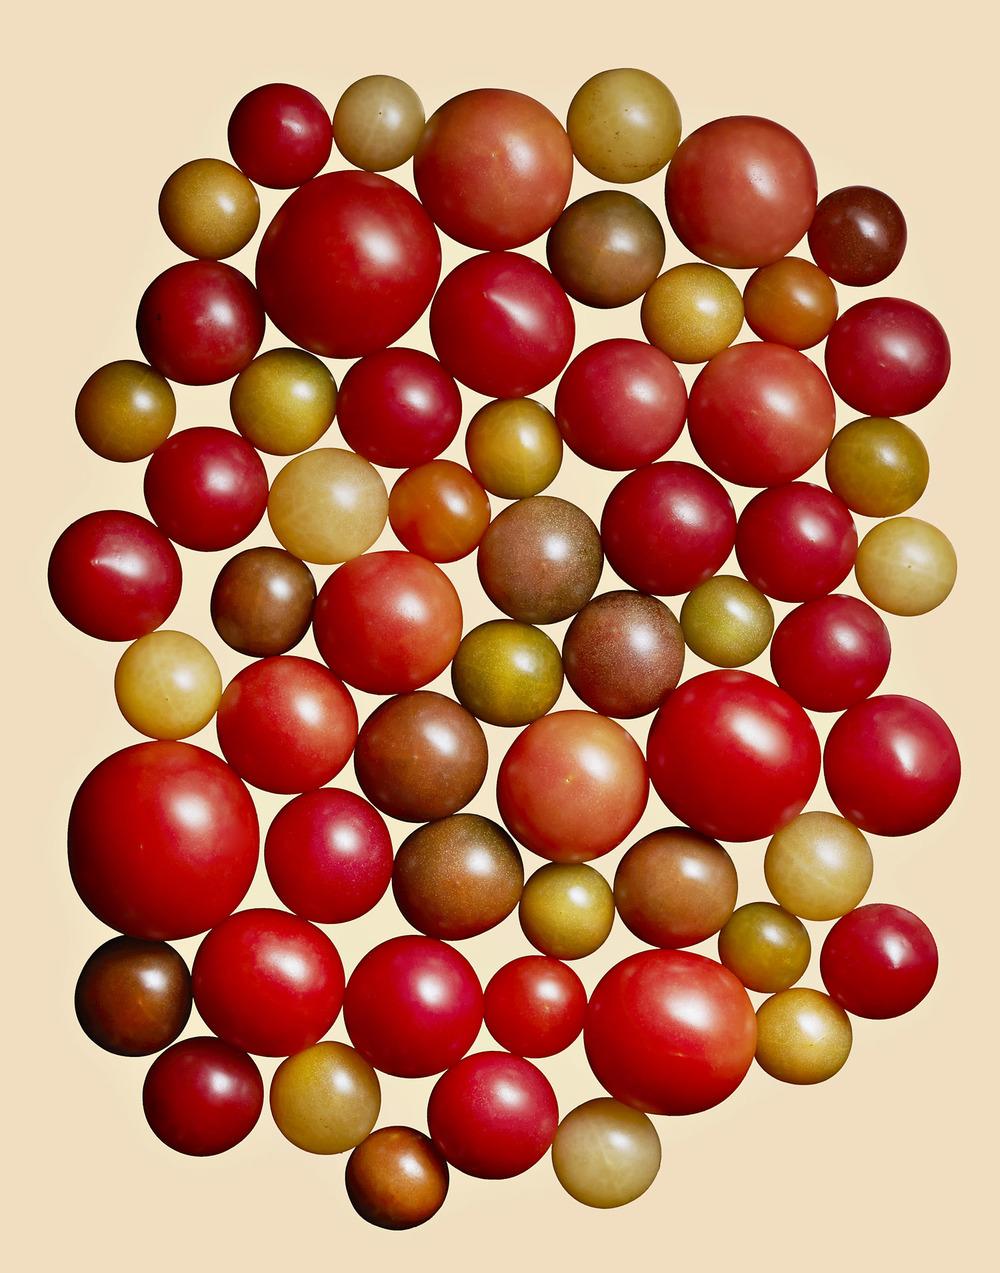 Heirloom Baby Tomatoes